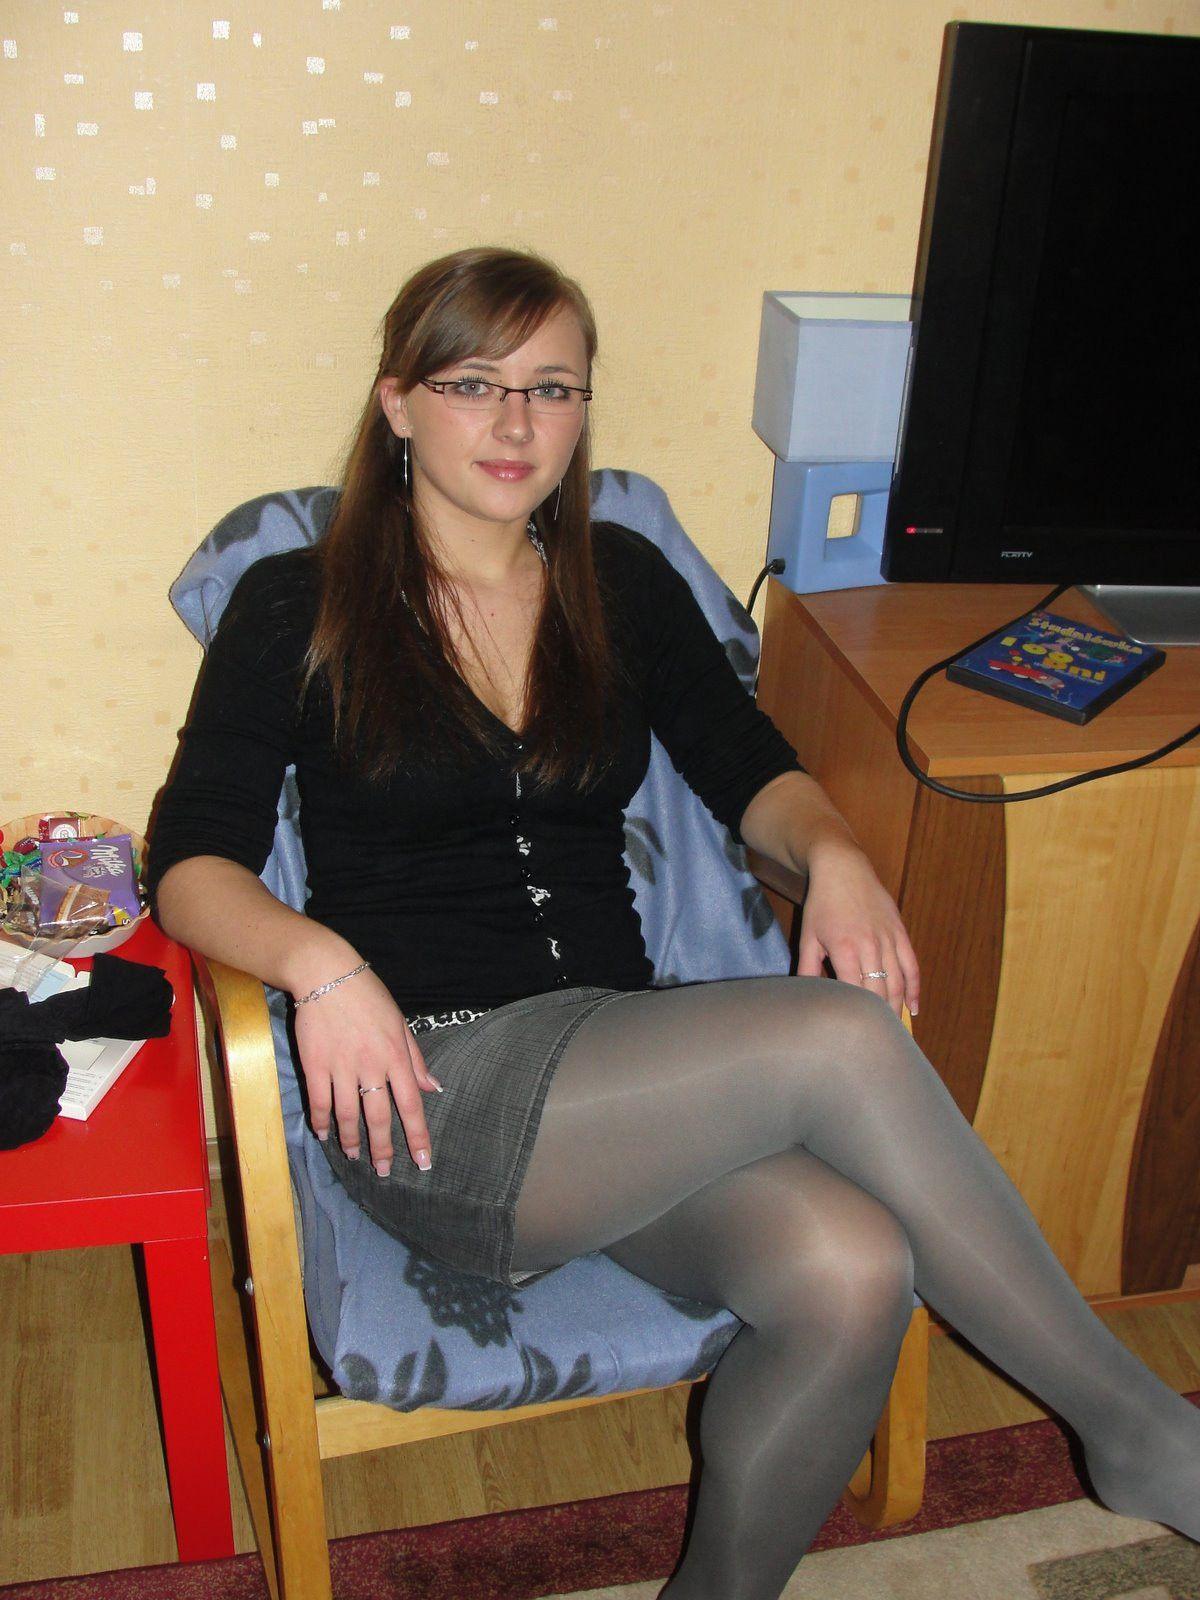 Panty-Jana-Web-Bilder  Photo  Girls In Mini Skirts -1021